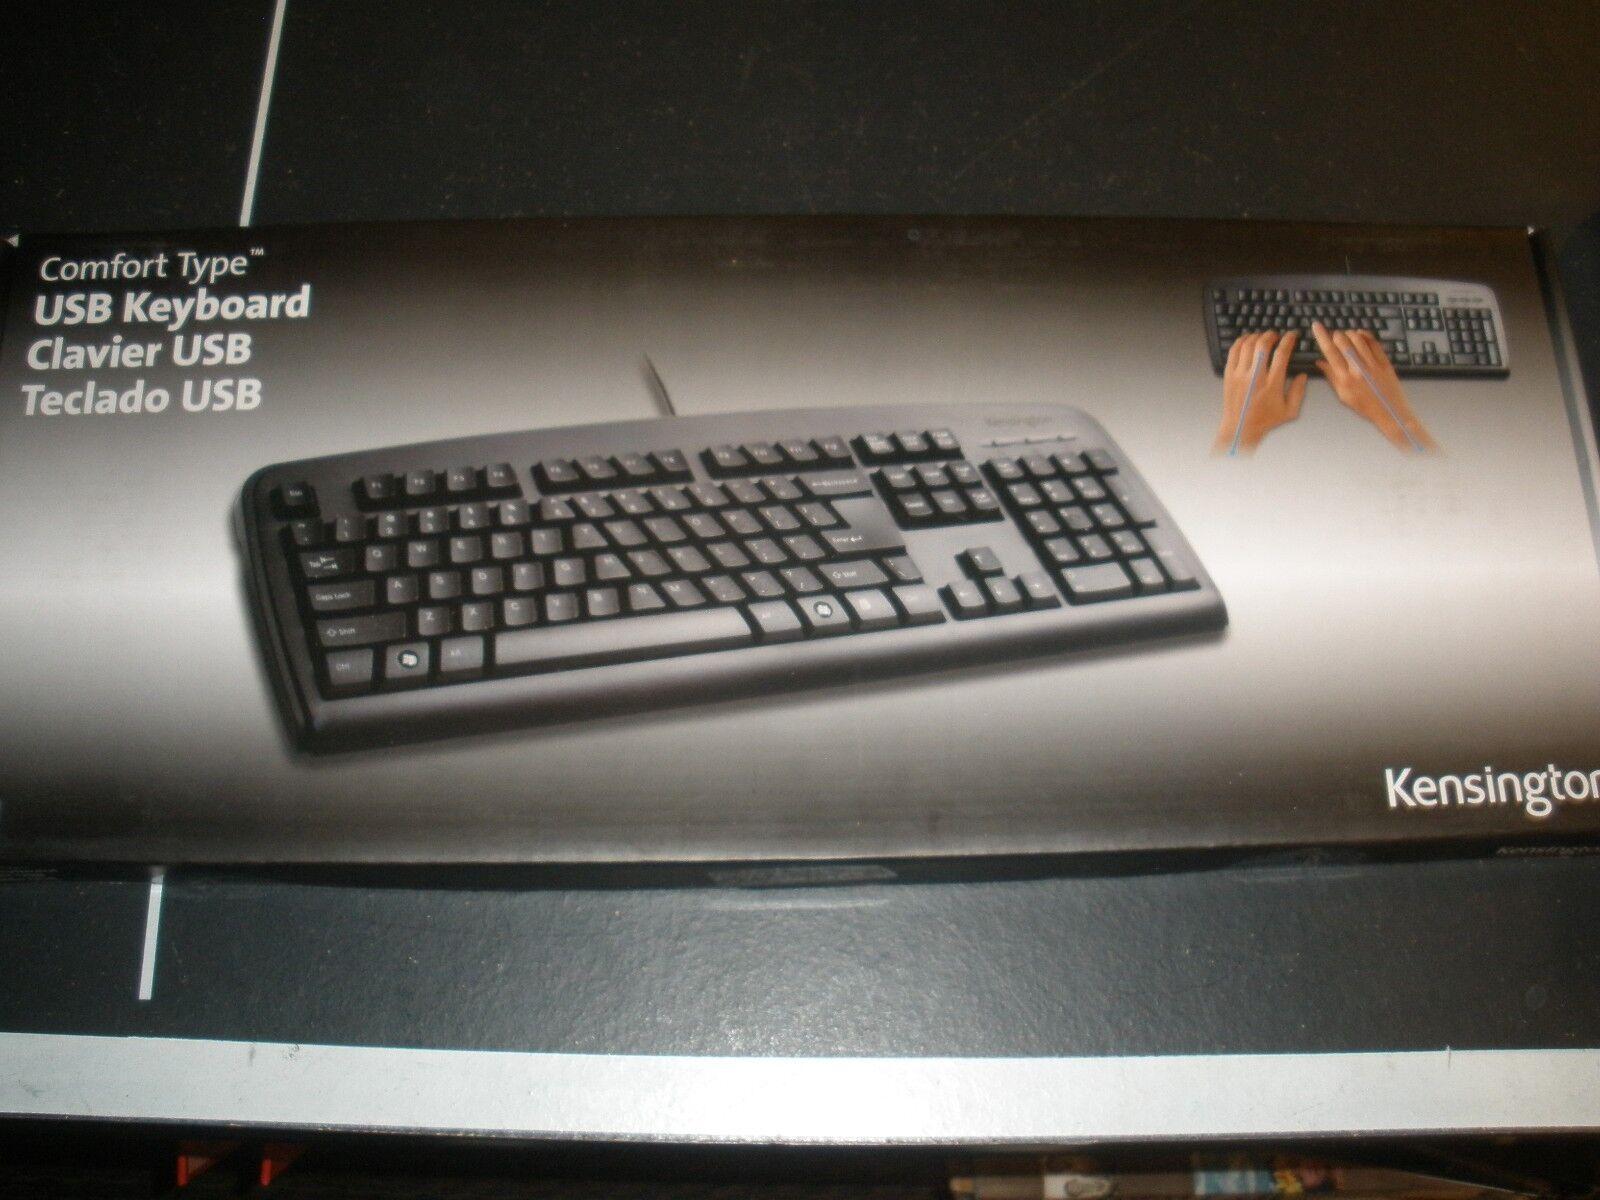 Comfort Type Keyboard